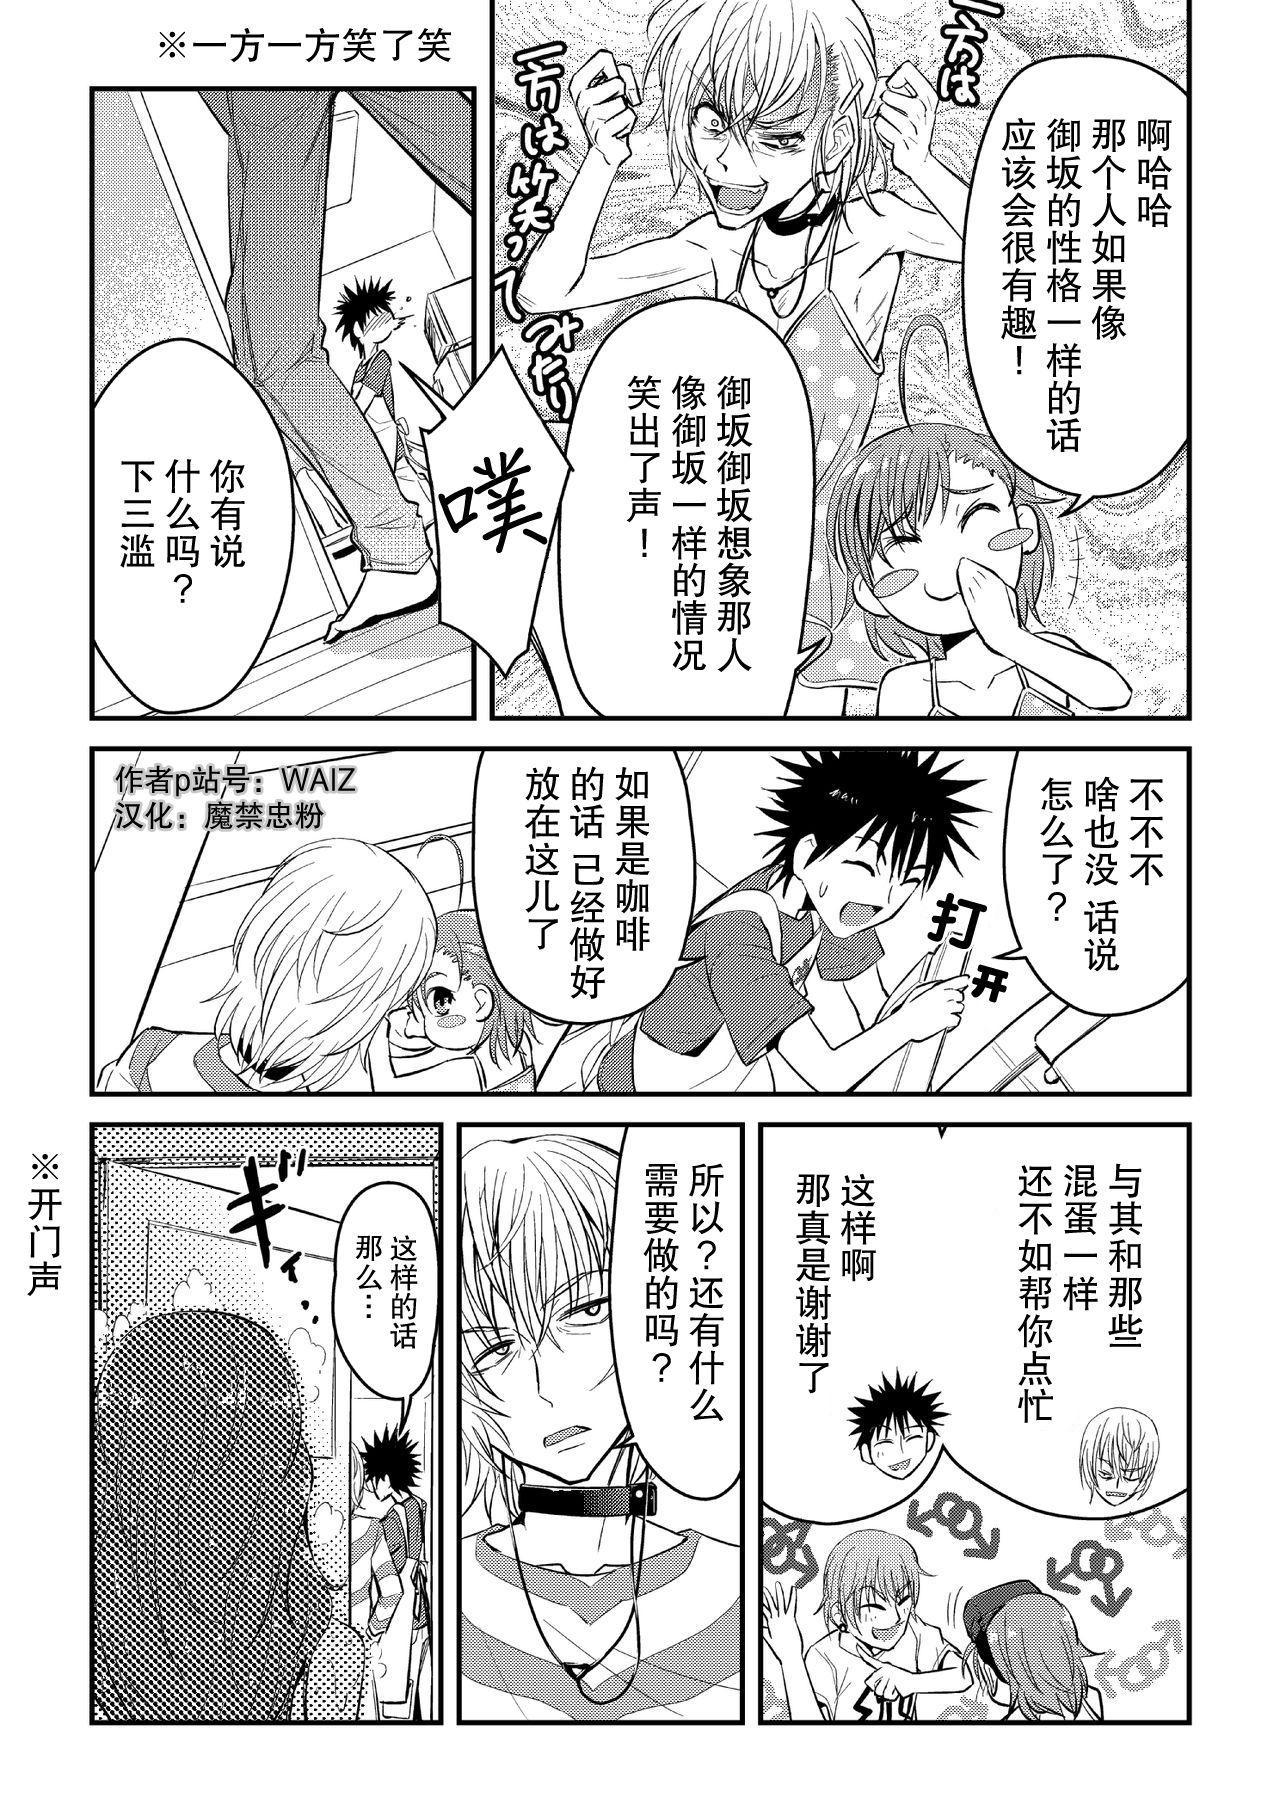 [WAIZ][同人个人渣汉化][就算是上条先生我家要住7个人还是太勉强了](Toaru Majutsu no Index) [中国翻译] 9